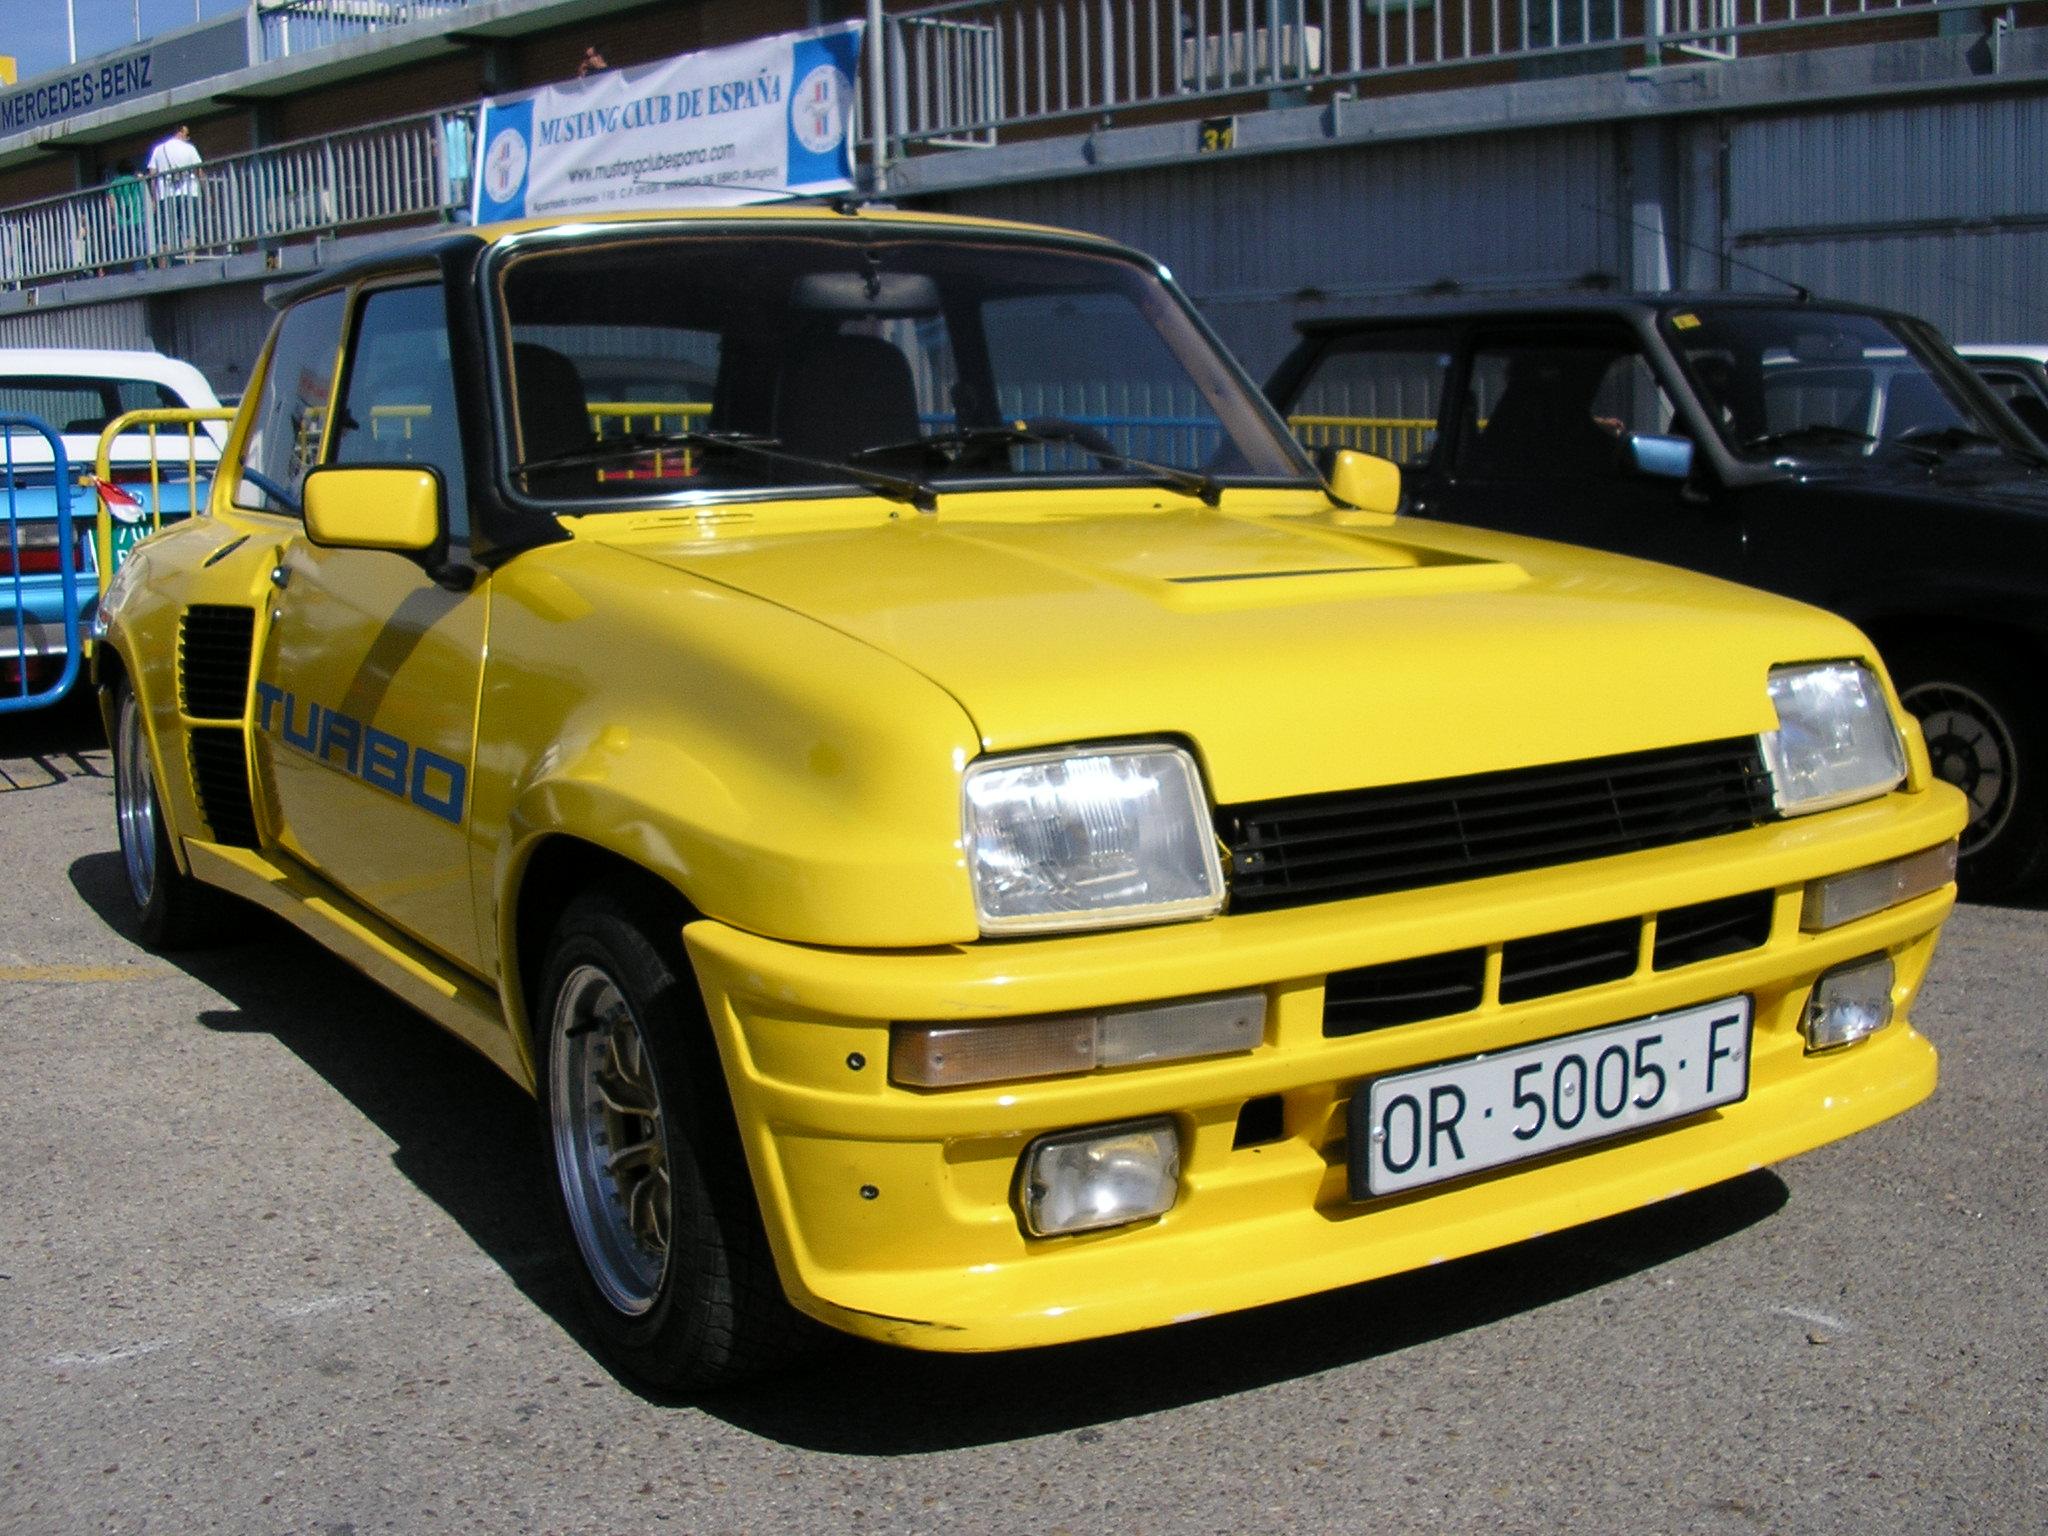 http://upload.wikimedia.org/wikipedia/commons/2/26/Renault_5_Maxiturbo_Jarama_2006d.jpg